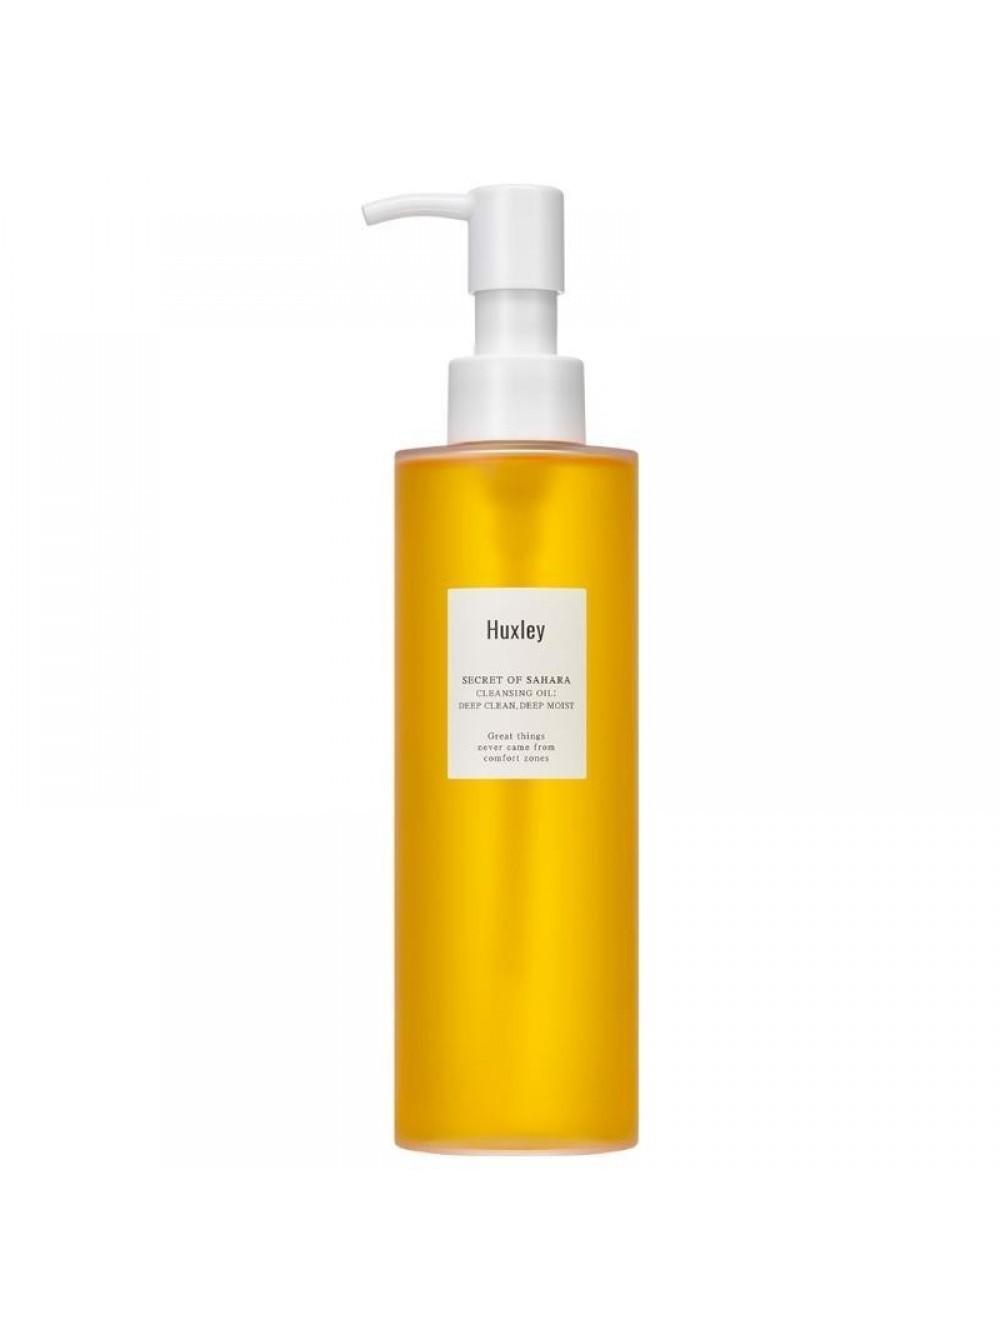 Гидрофильное масло Huxley Deep clean, deep moist 200мл